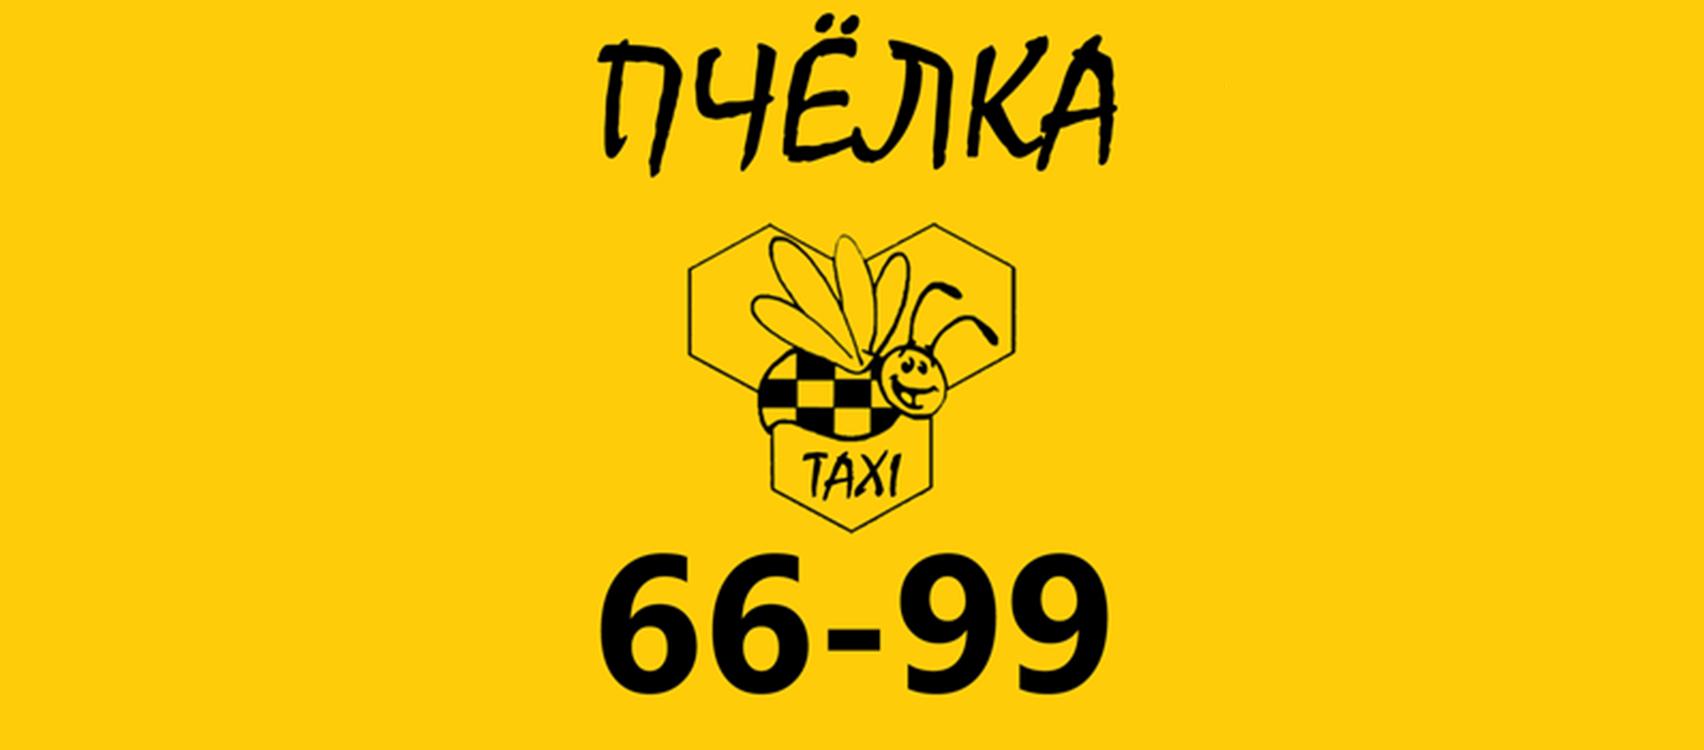 "Таксі ""ПЧЁЛКА""  (Запоріжжя)"